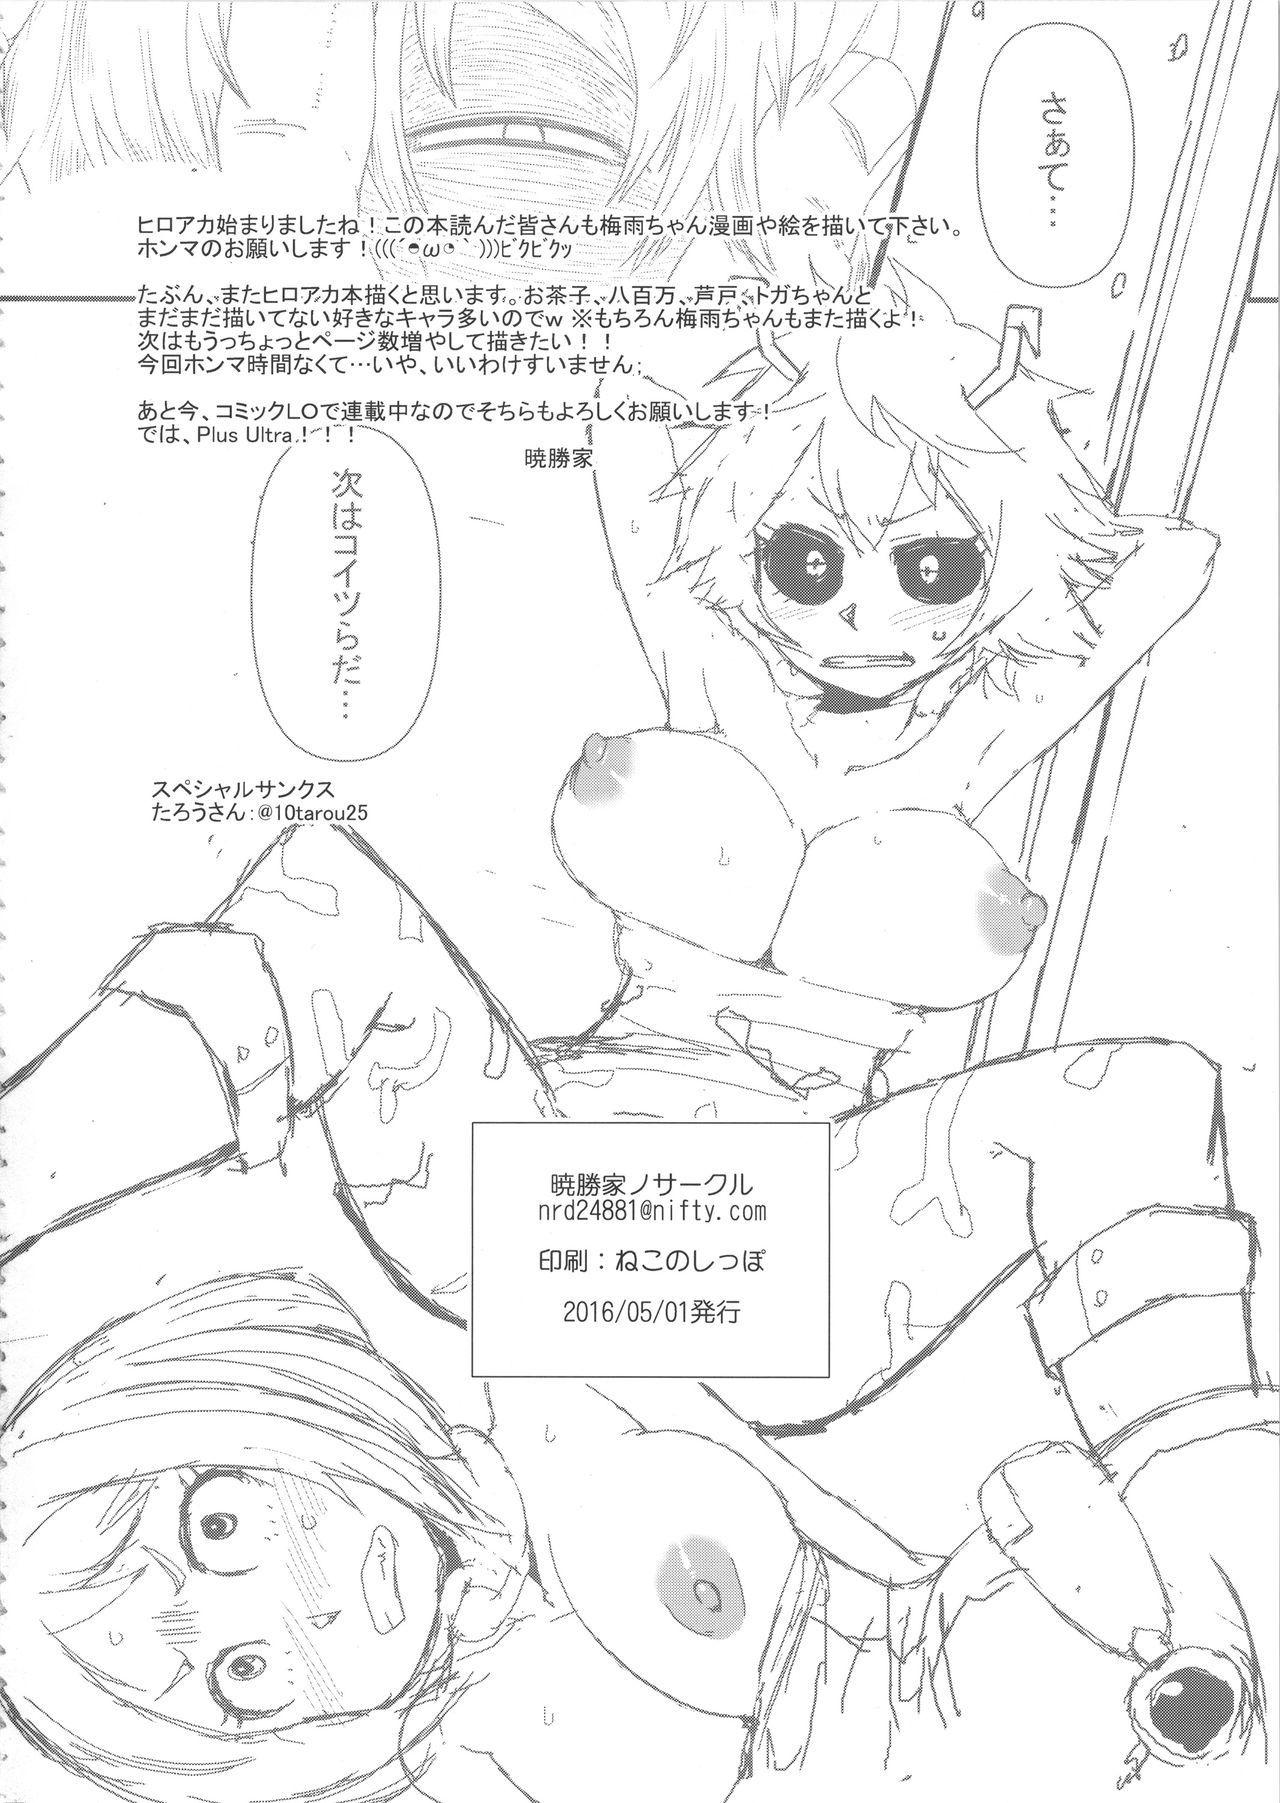 Boku no dark hero academia hentai manga picture 17